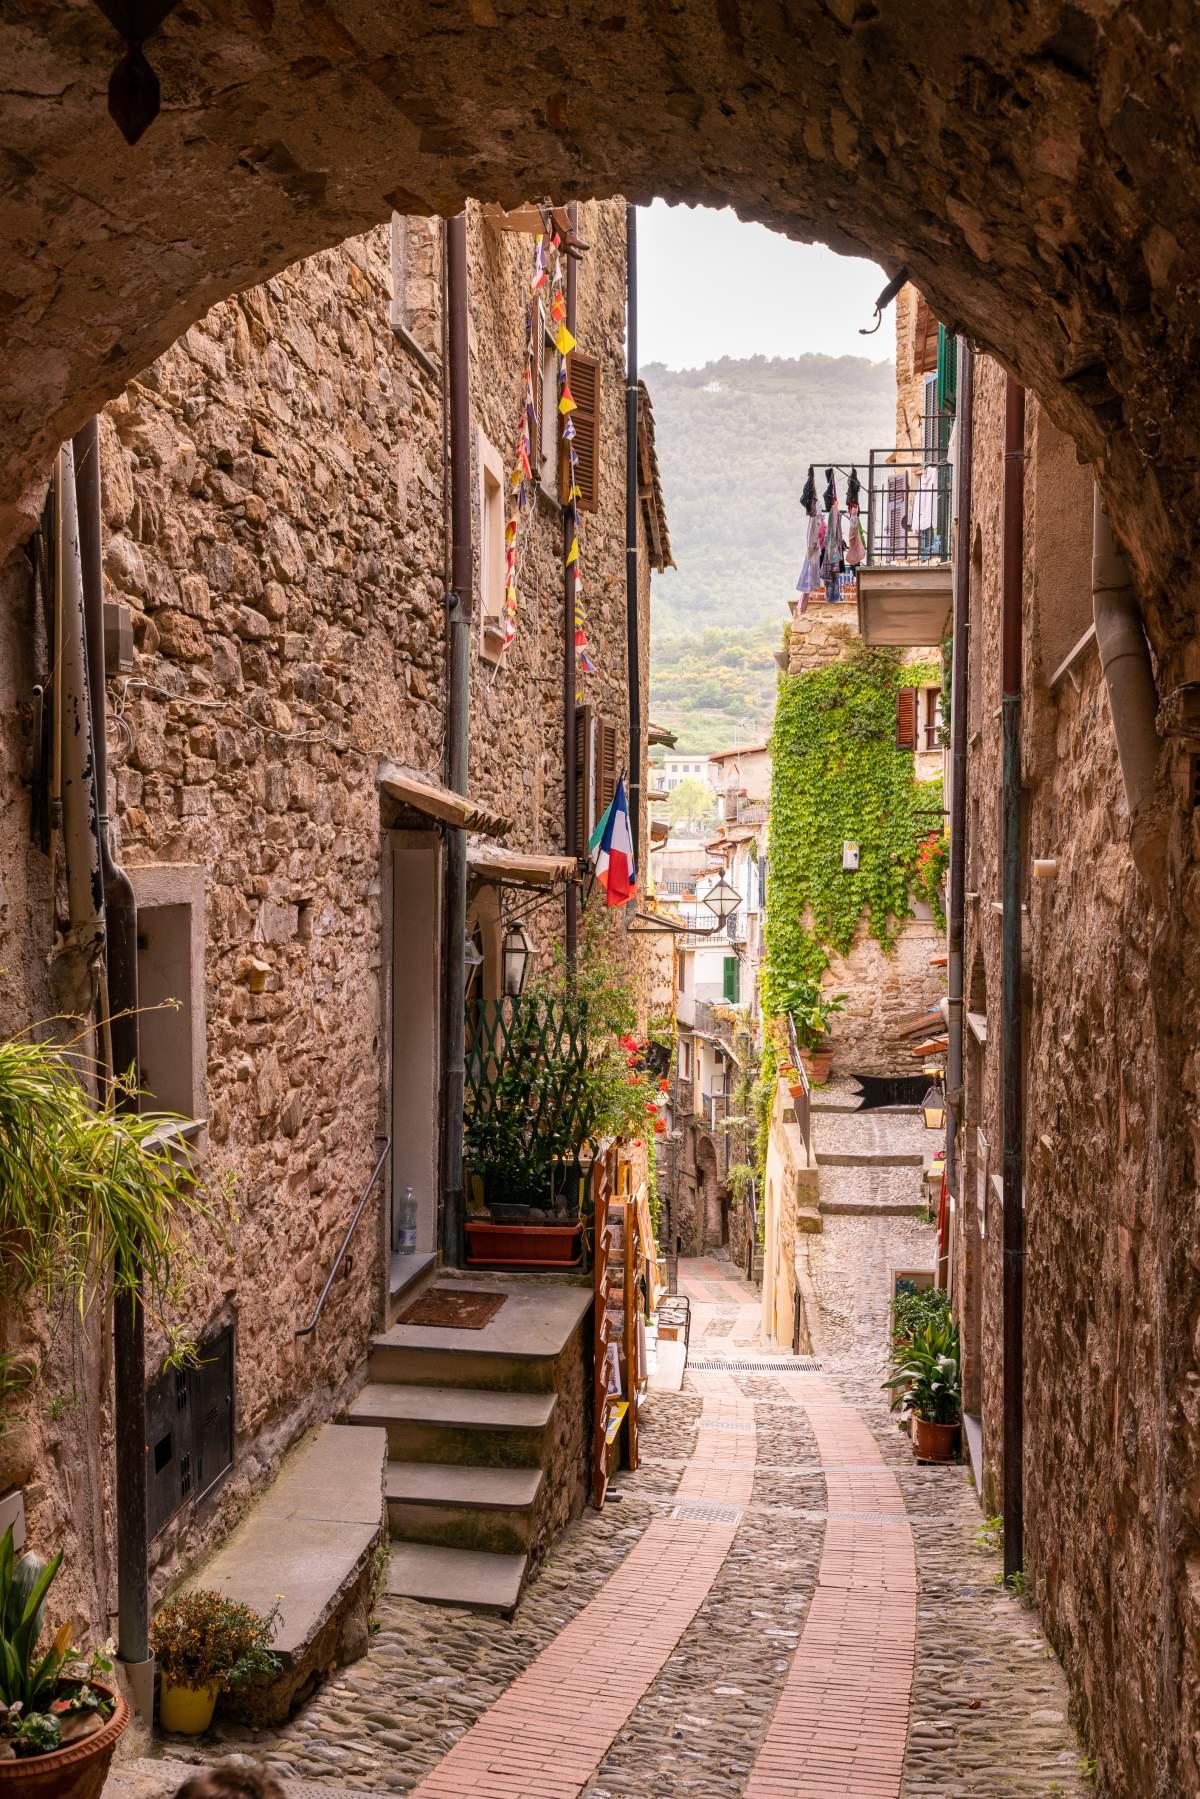 Dolceacqua μεσαιωνικό χωριό, σοκάκι, Ιταλία